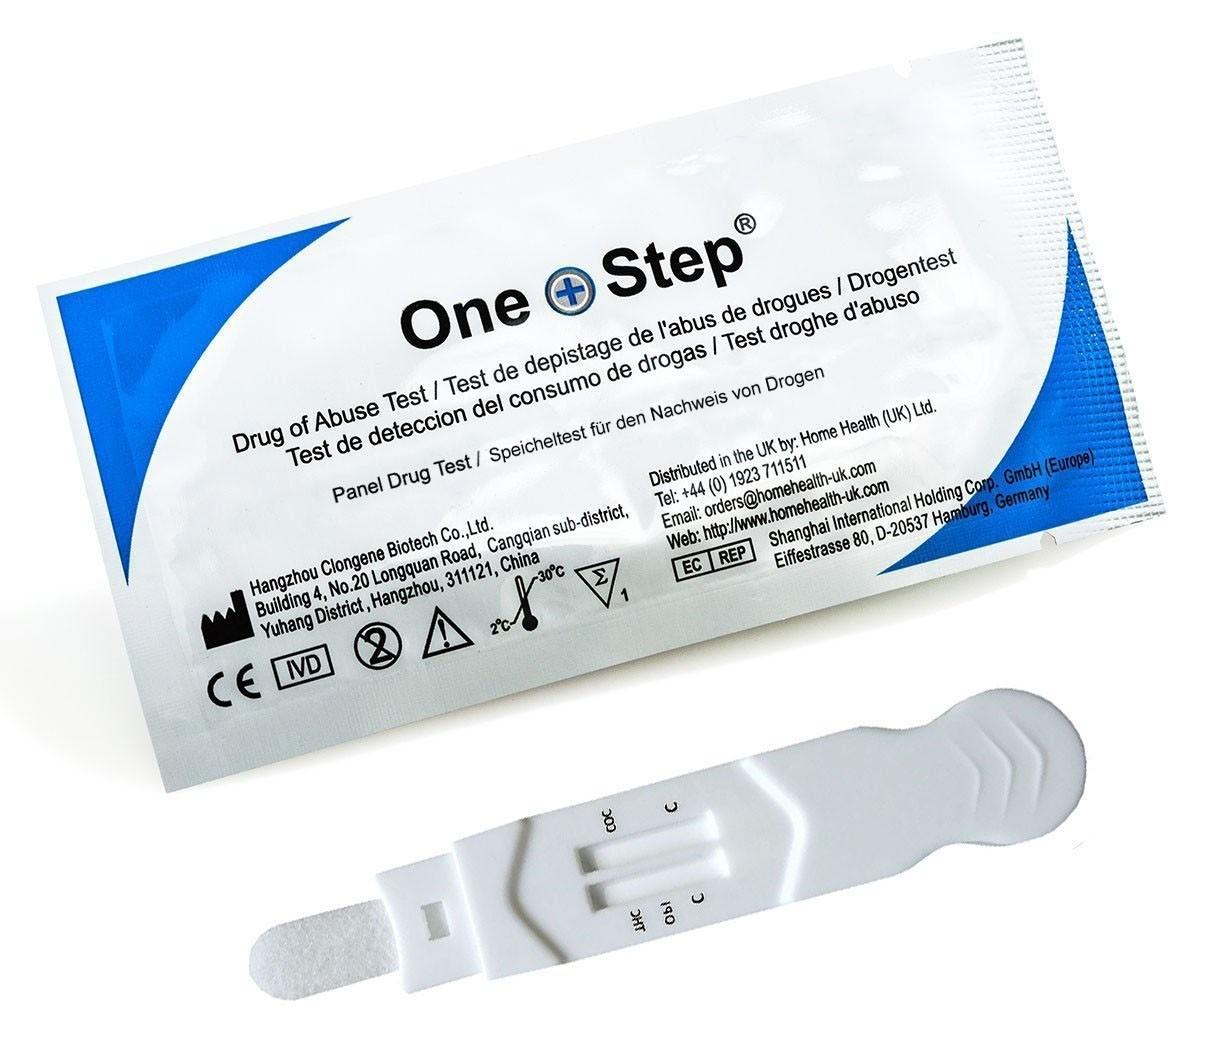 Drogentest Speichel Multi 3 Teststab, 2 Stück - THC (Marihuana), Kokain, Opiate